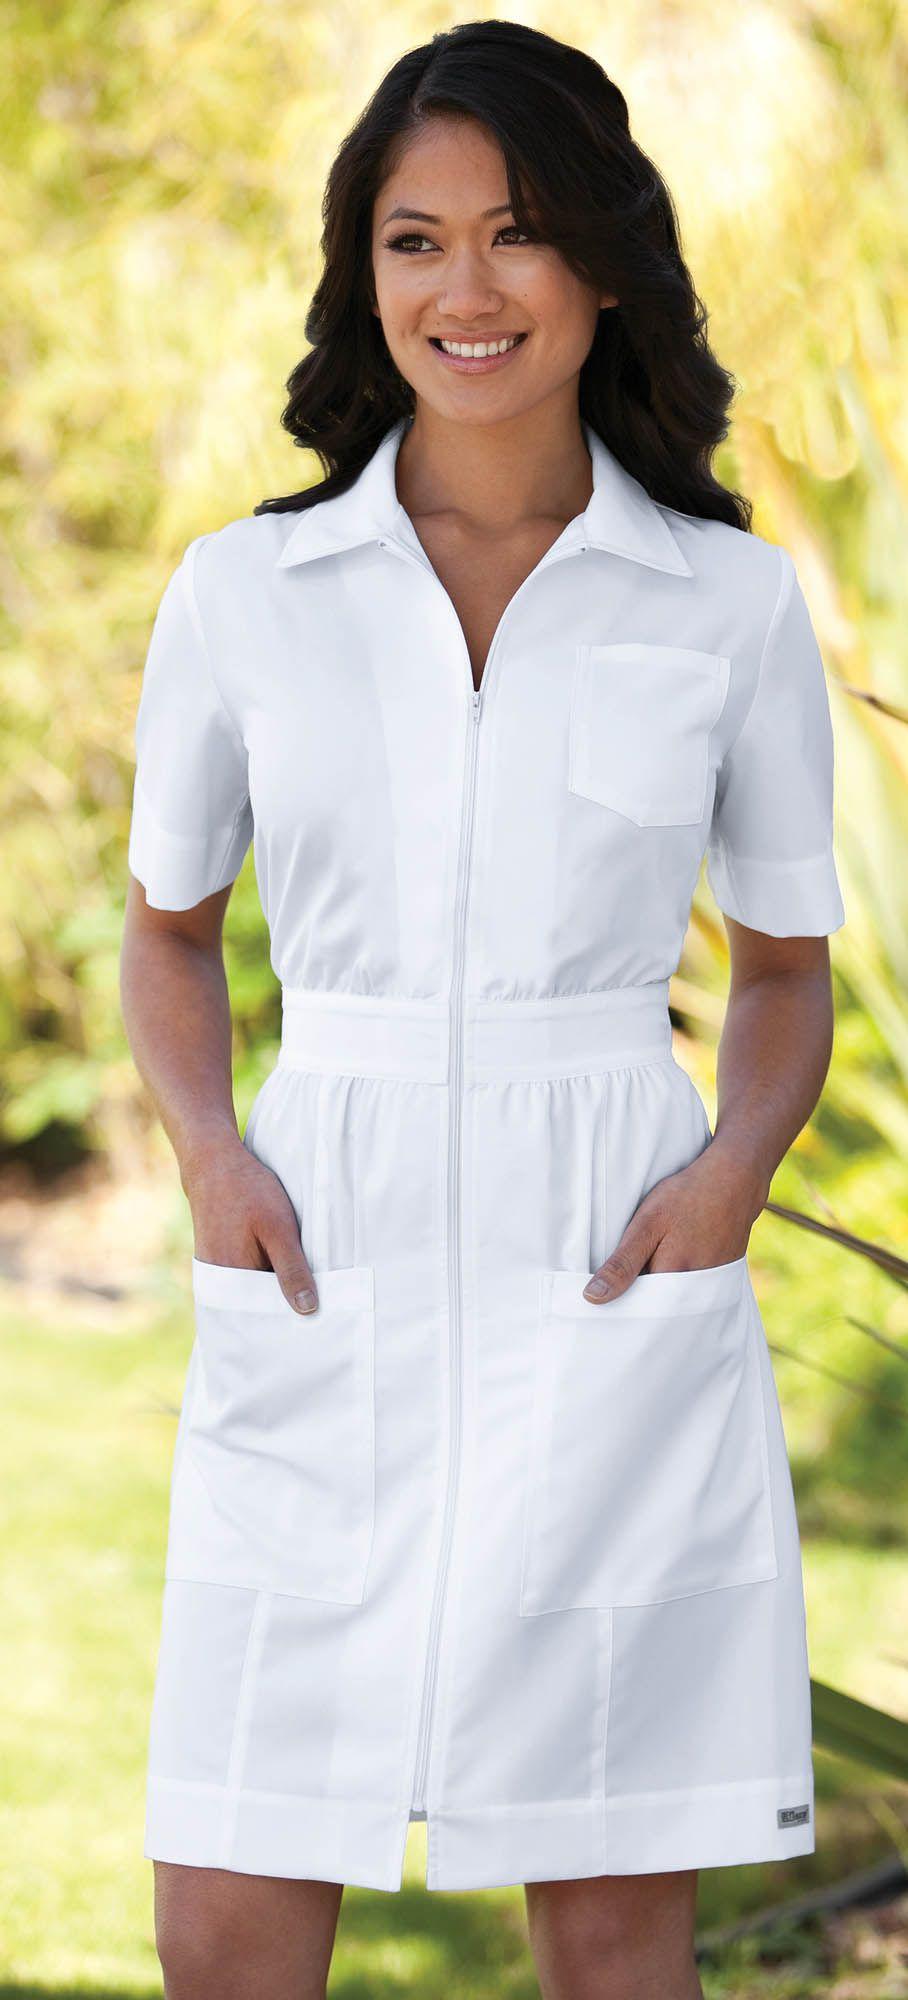 Nurse stylish uniform dresses 2019